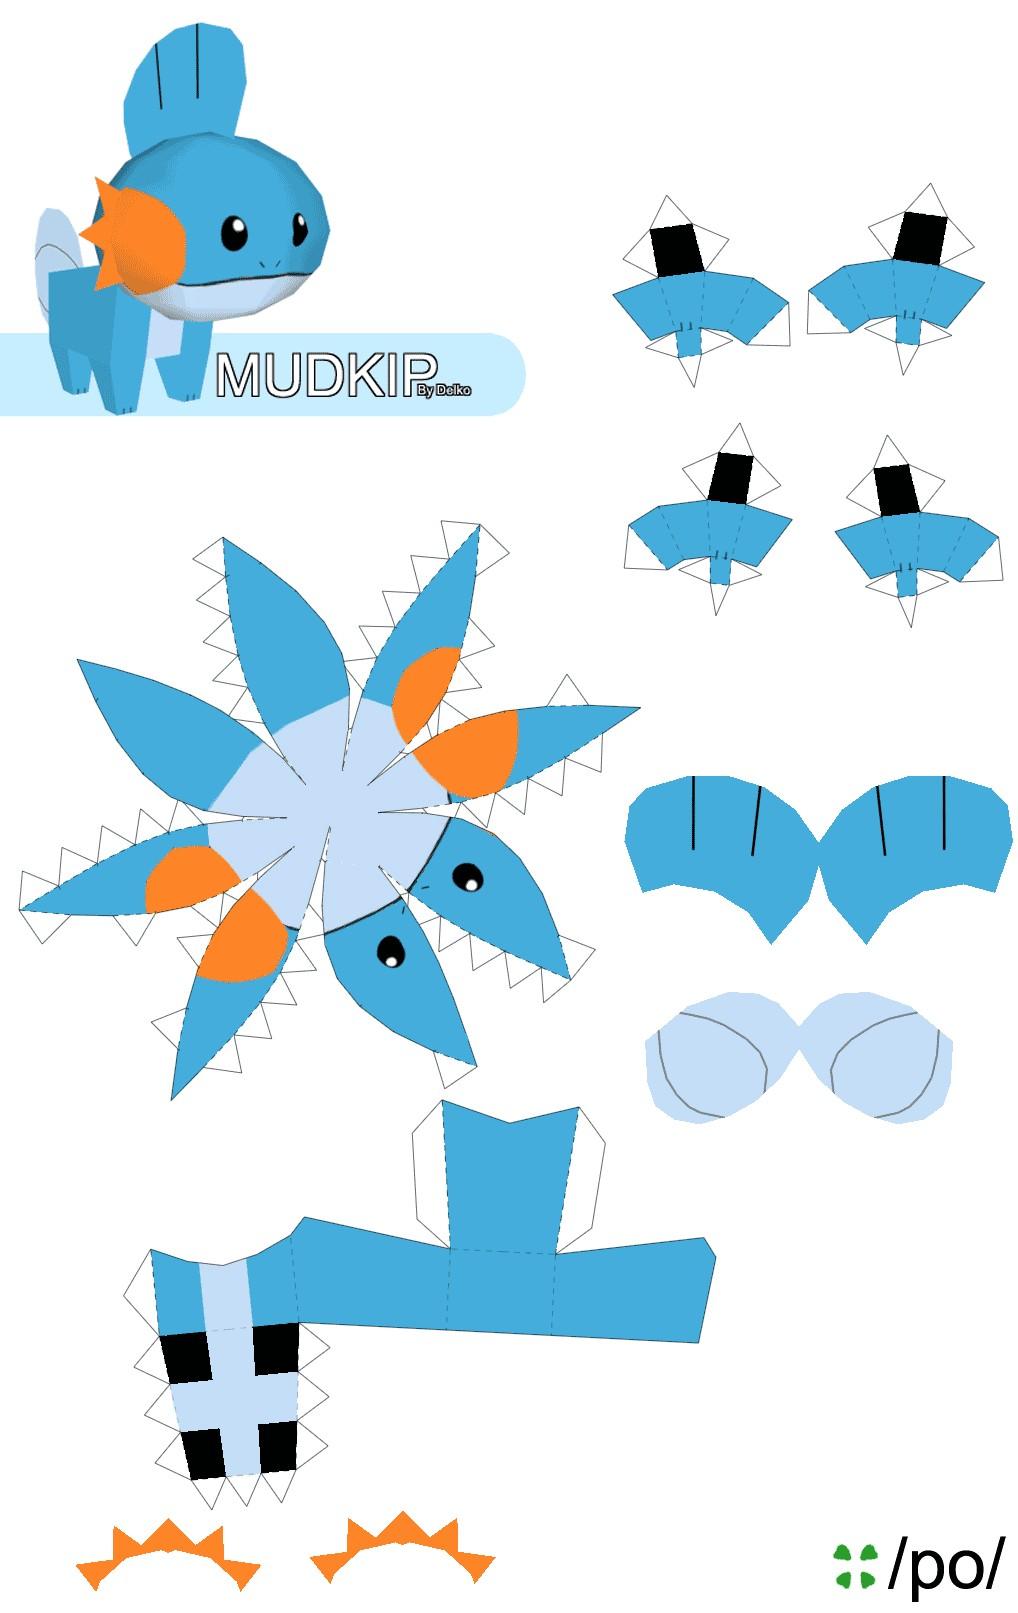 Mudkip Papercraft Davi Gaeschlin Davigaeschlin On Pinterest